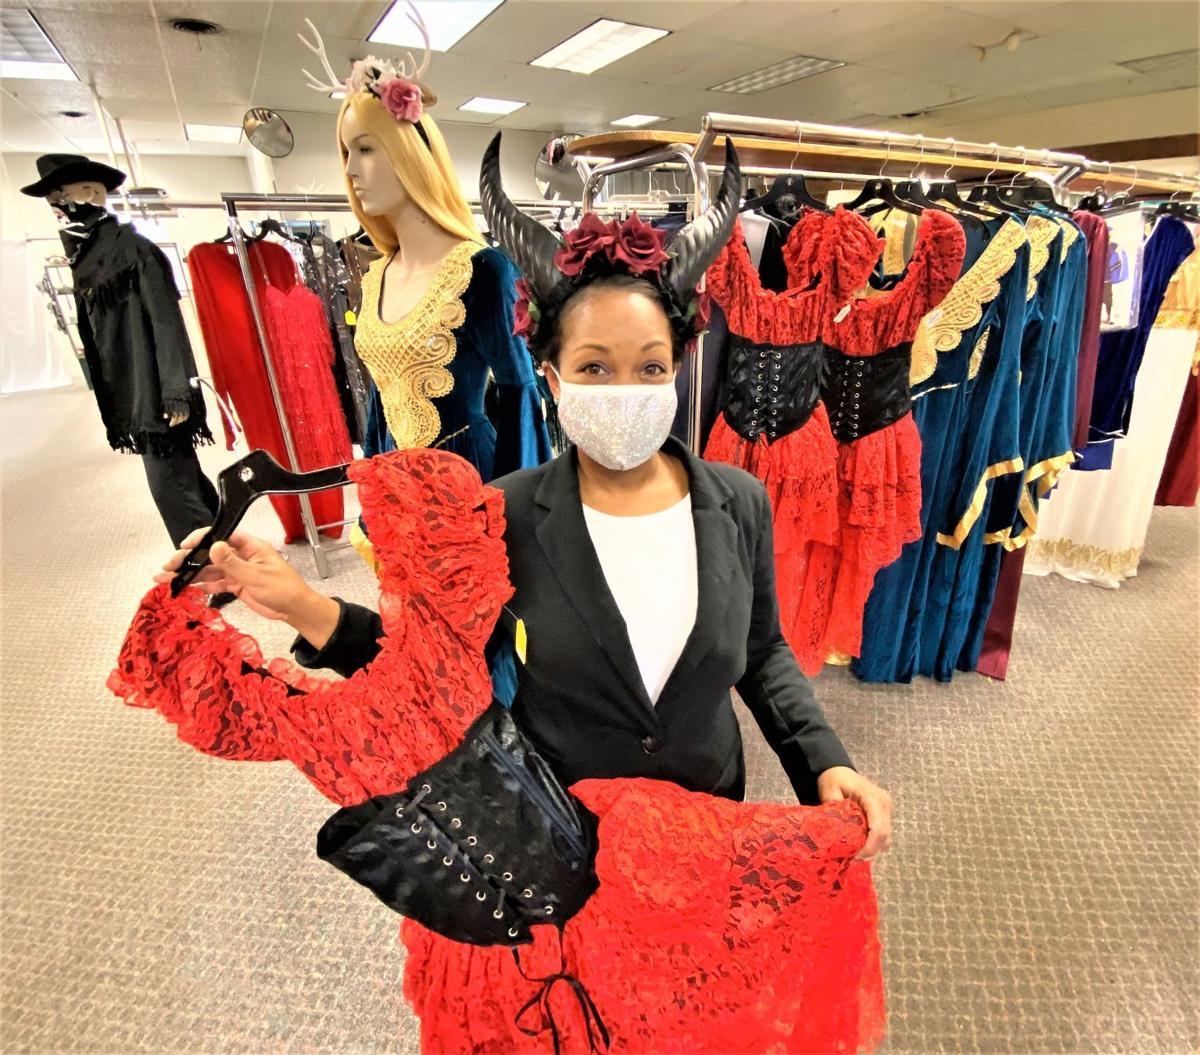 Chelee Lattimore owns Premier Costumes